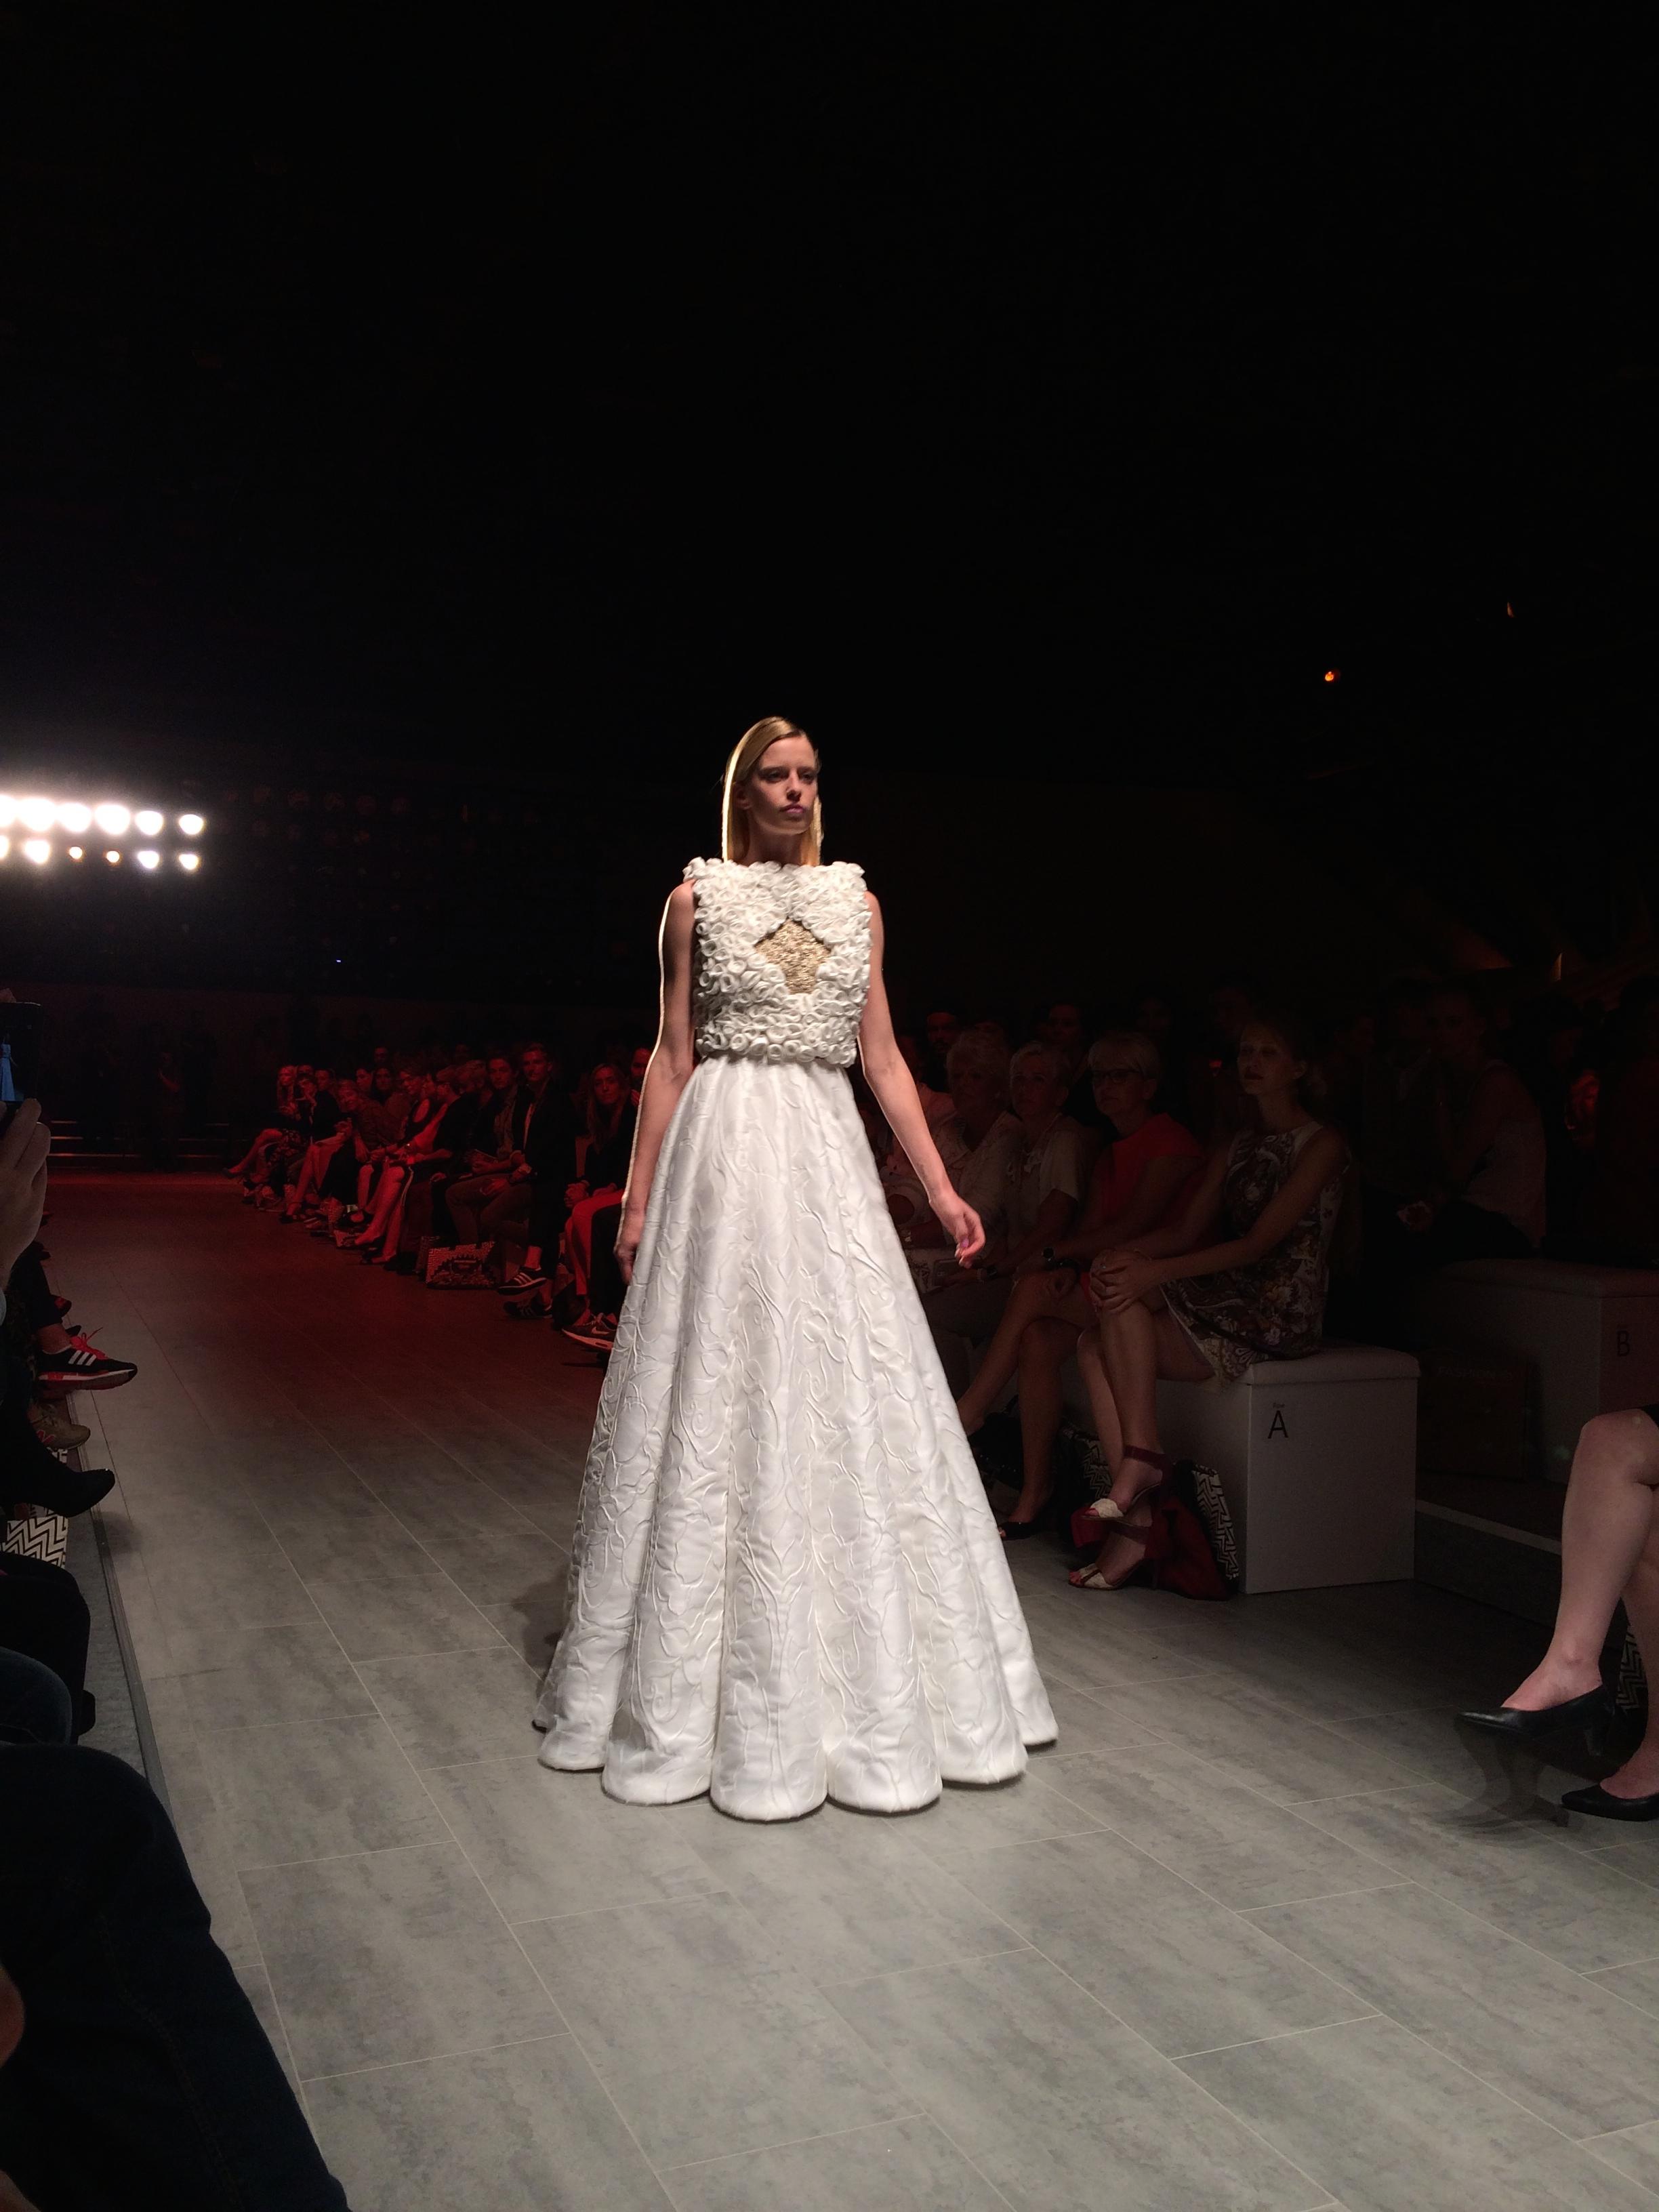 MBFW 2014 - Kilian Kerner Fashion Show